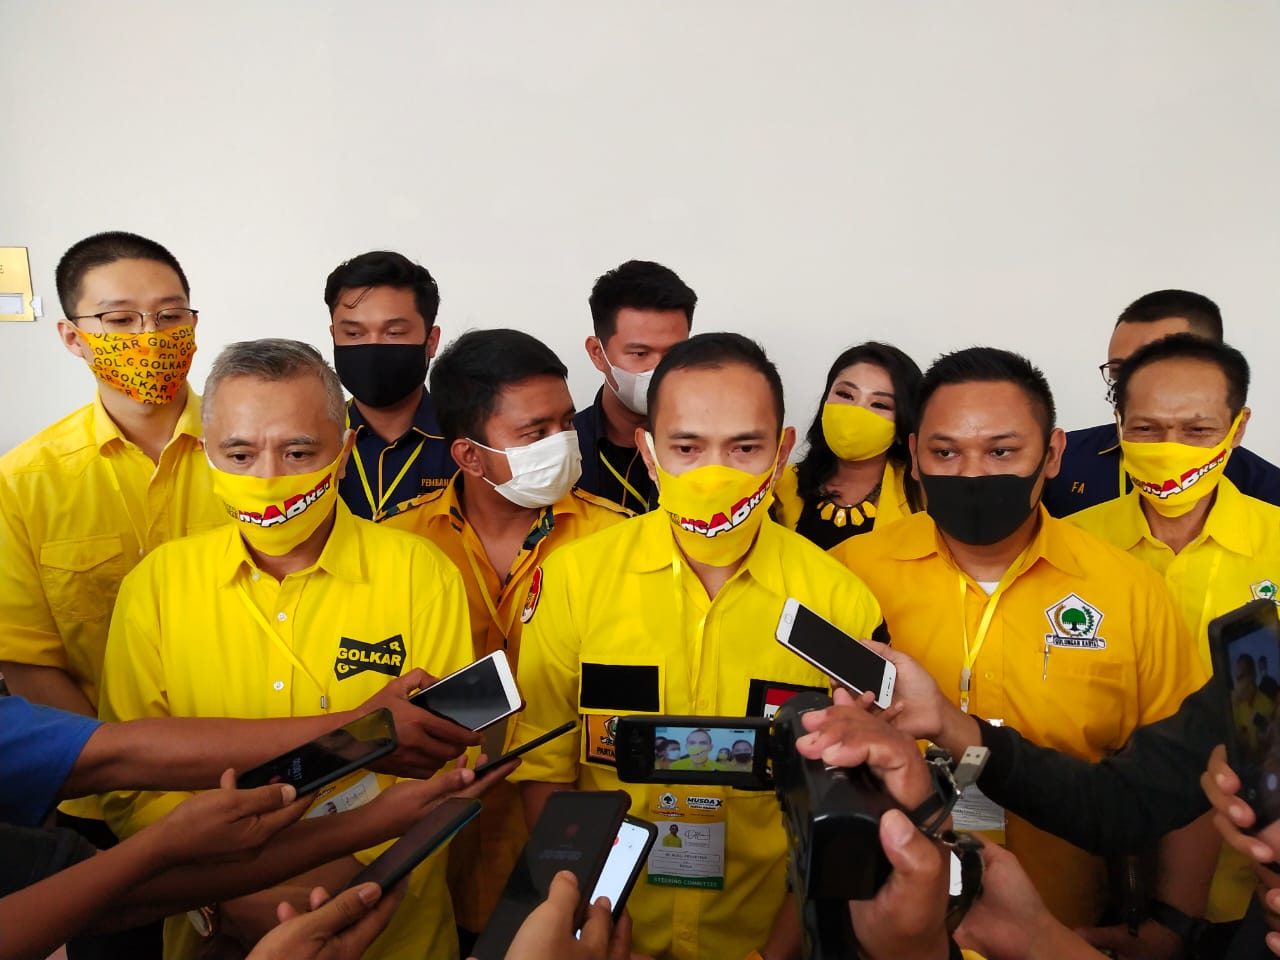 Golkar Bagikan Seribu Paket Takjil dan Sahur di Kota Bogor